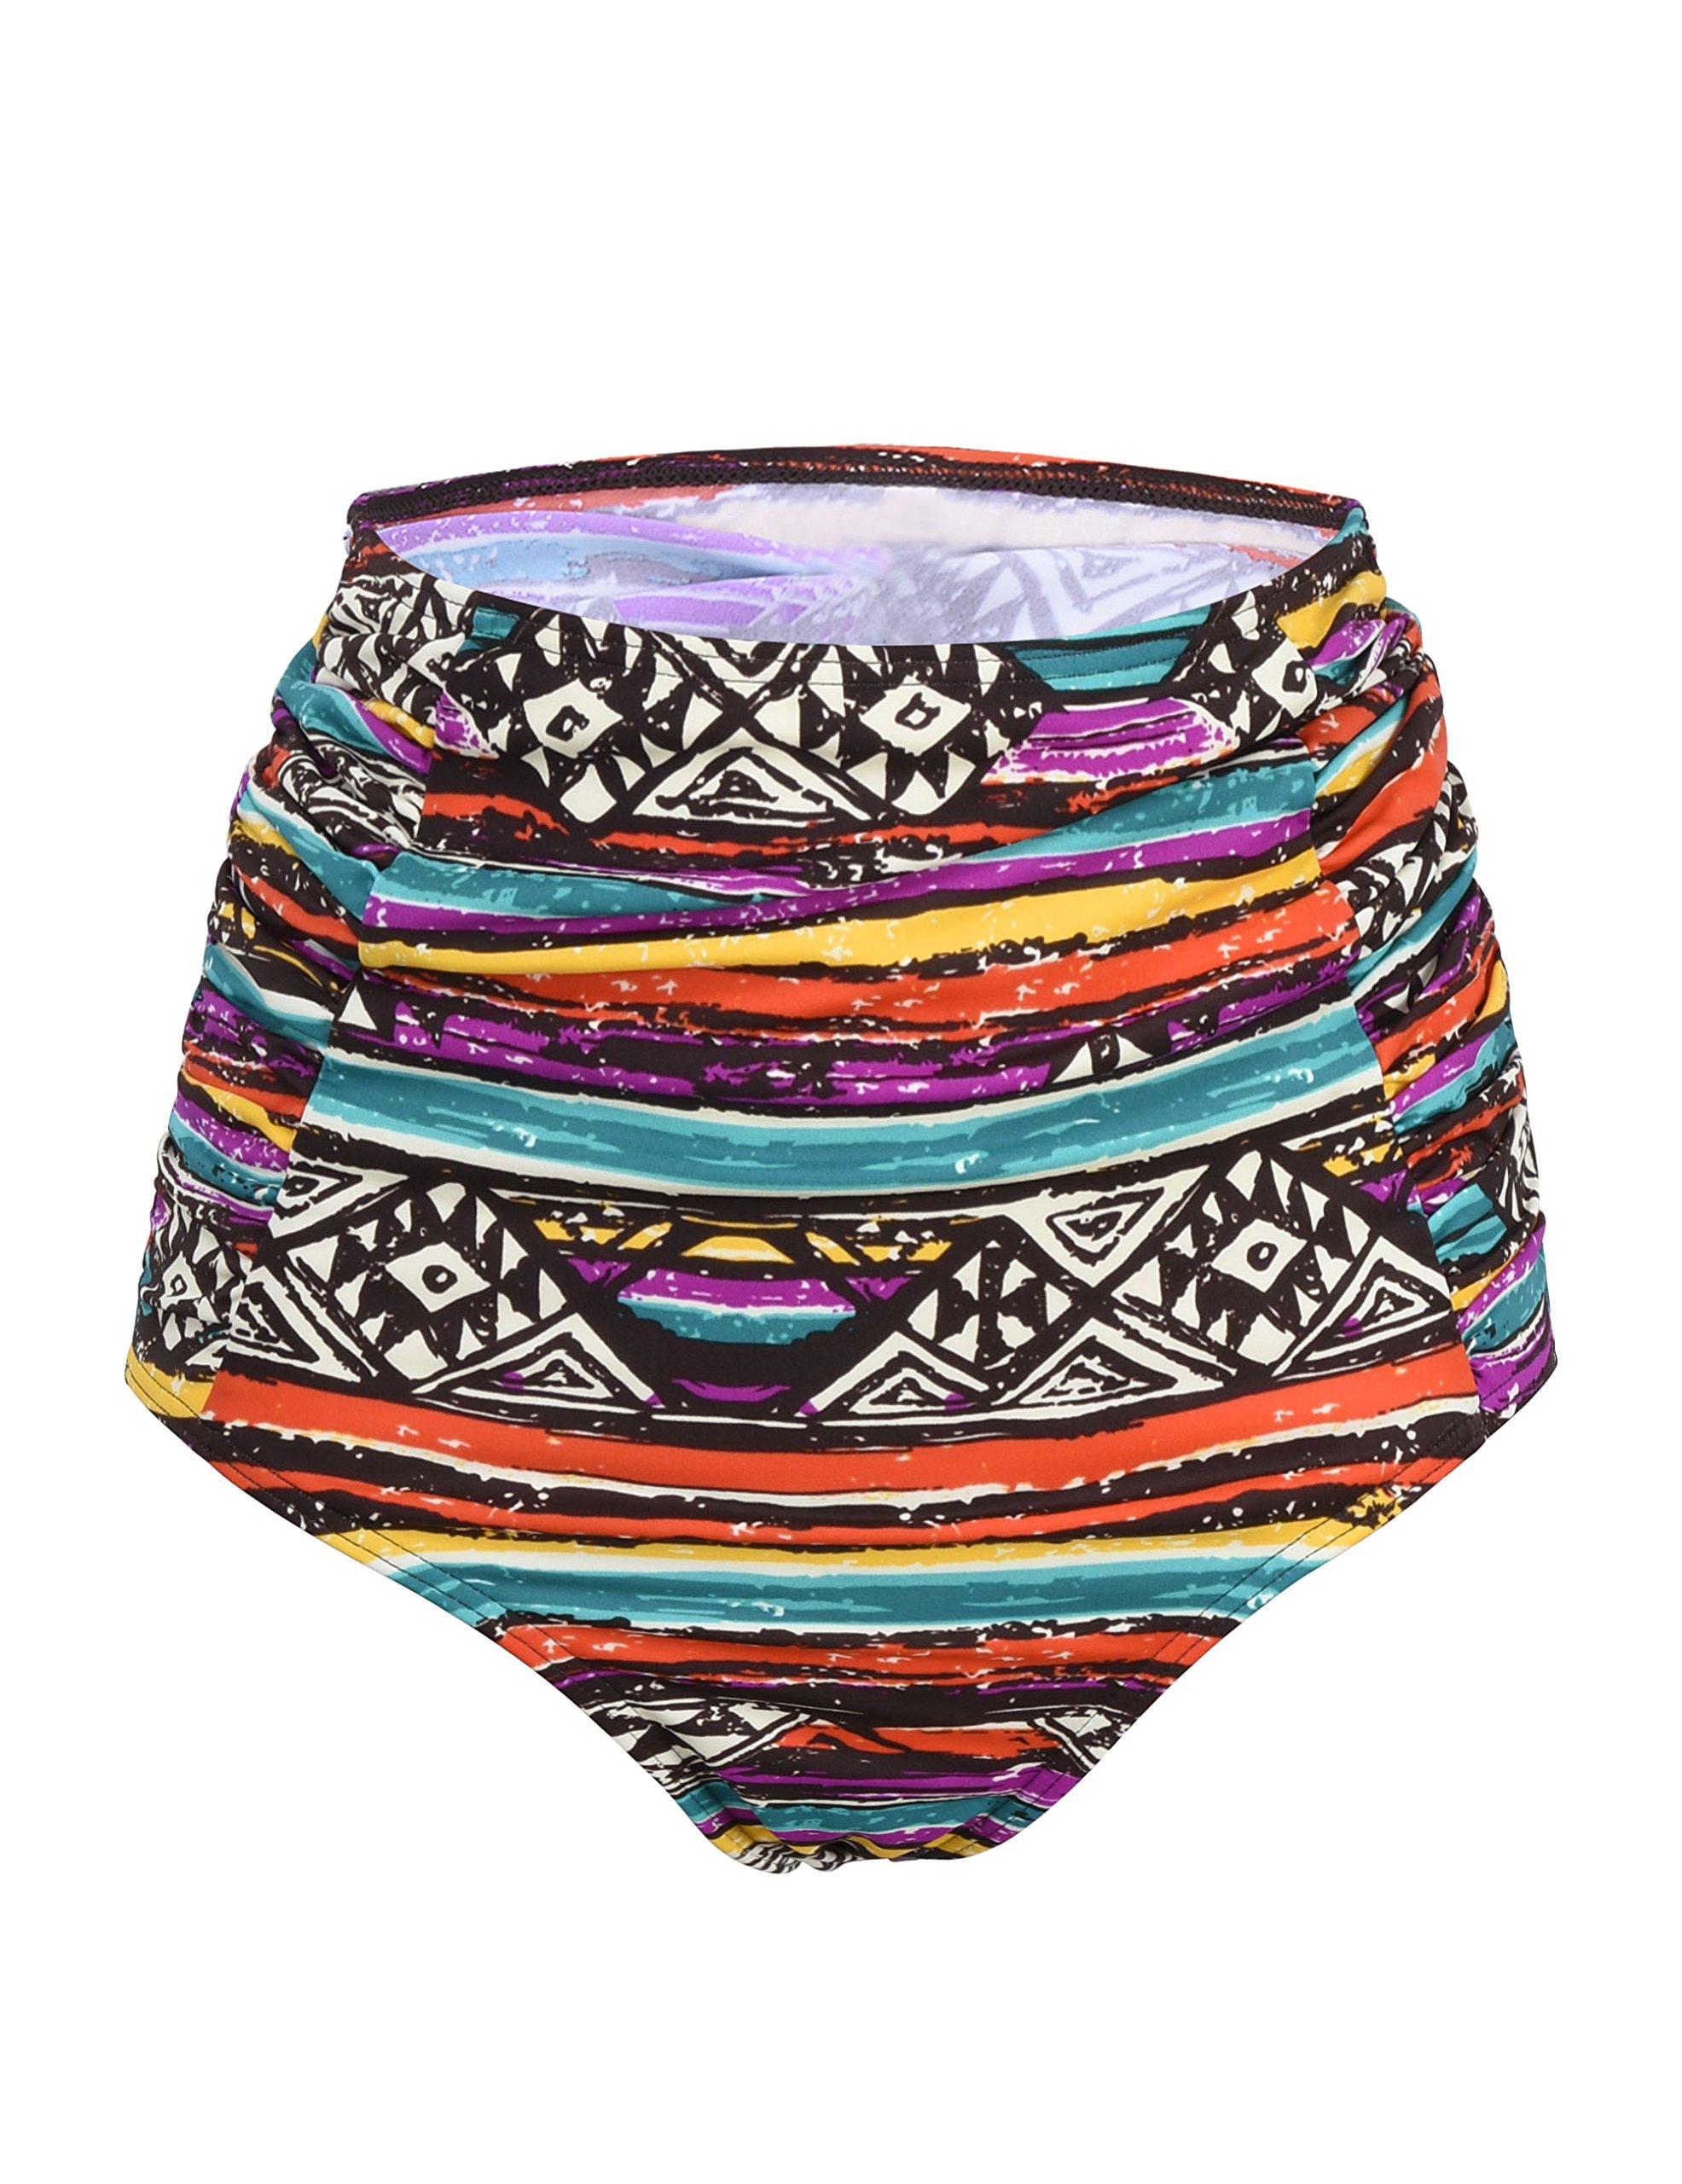 Septangle Women's Vintage High Waisted Bikini Bottom Shirred Tankini Briefs (14, National Style) by Septangle